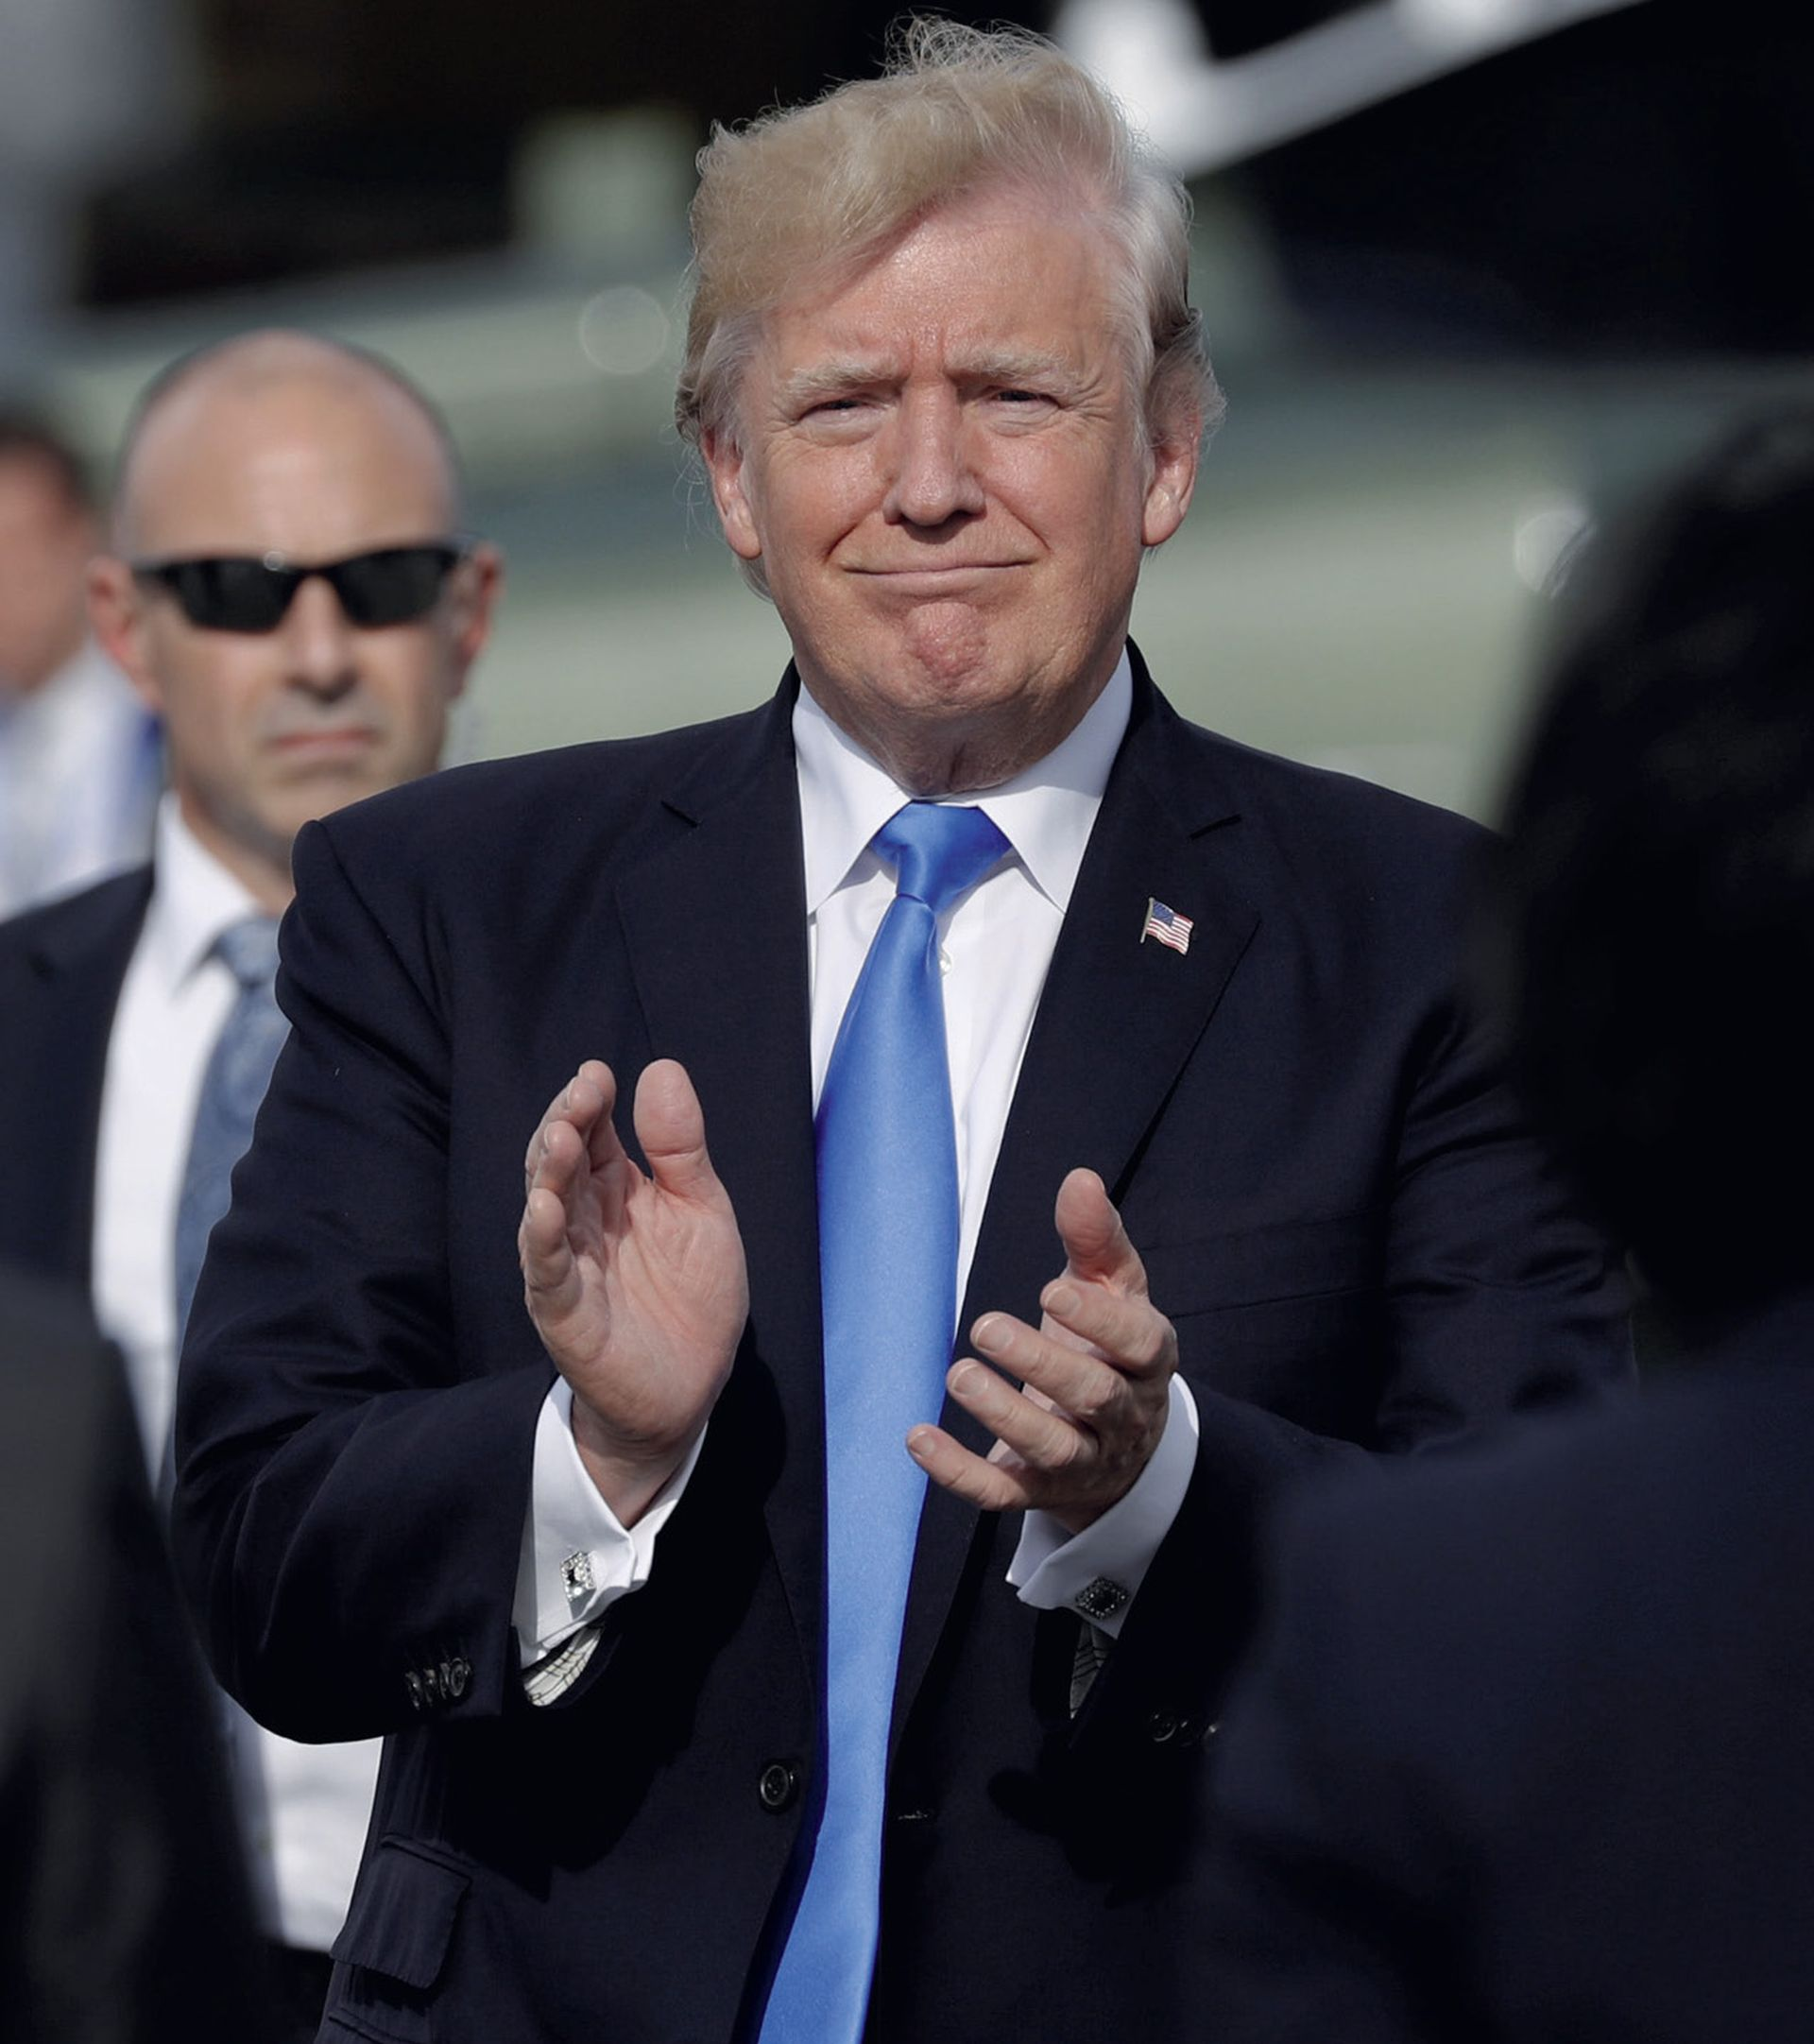 'Trump mora hitno reagirati kako bi se očuvao mir na Balkanu'